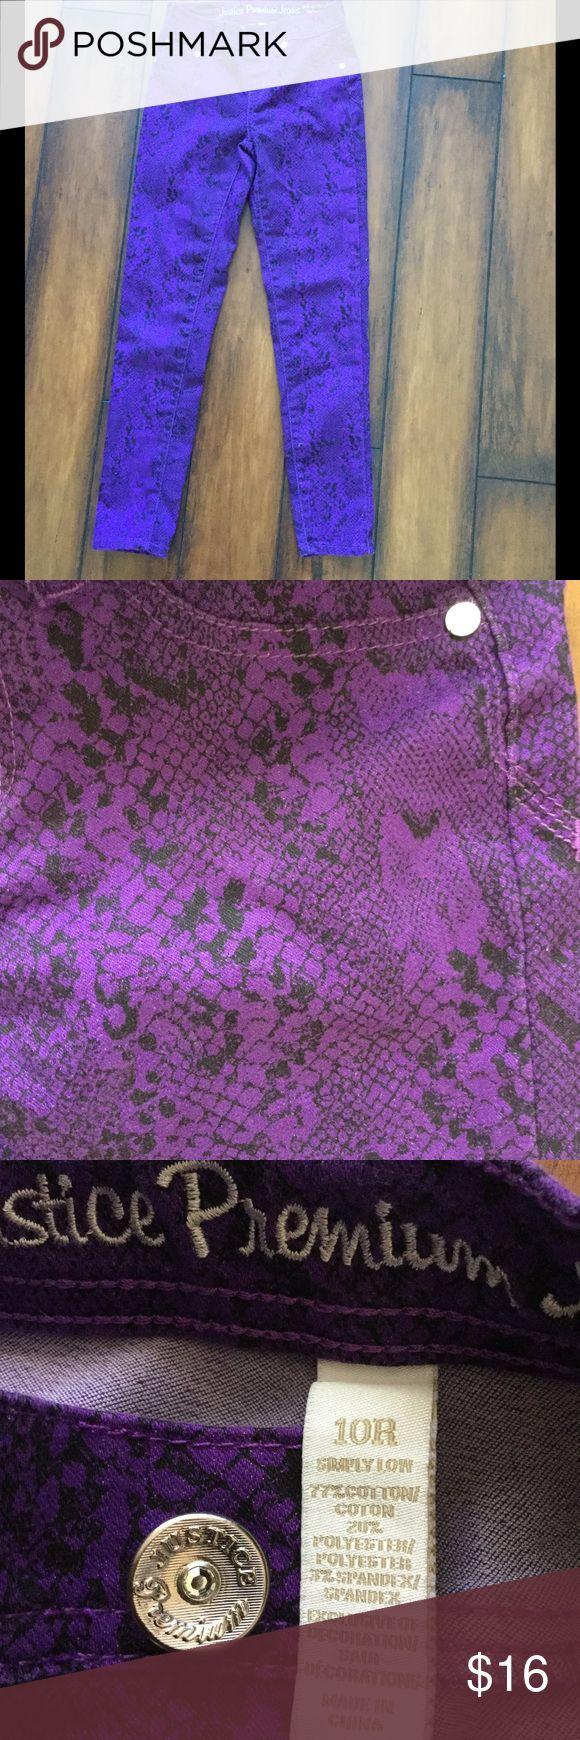 Justice purple snake print pants Cute purple and black snake print pants. Size 10r by justice.  Preloved euc Justice Bottoms Jeans